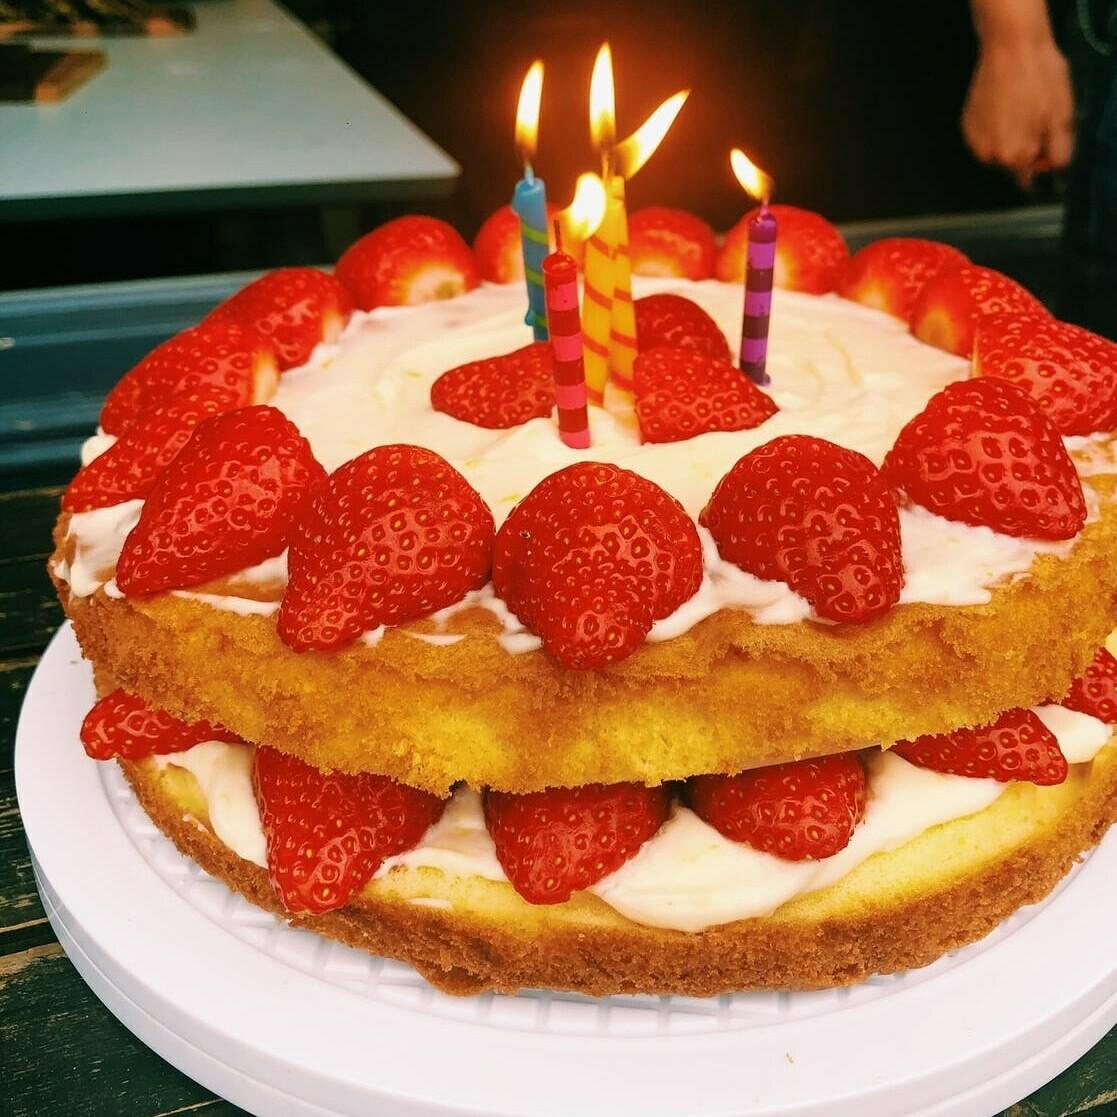 Victoria Sponge with a Lemon Mascarpone Cream and Strawberries